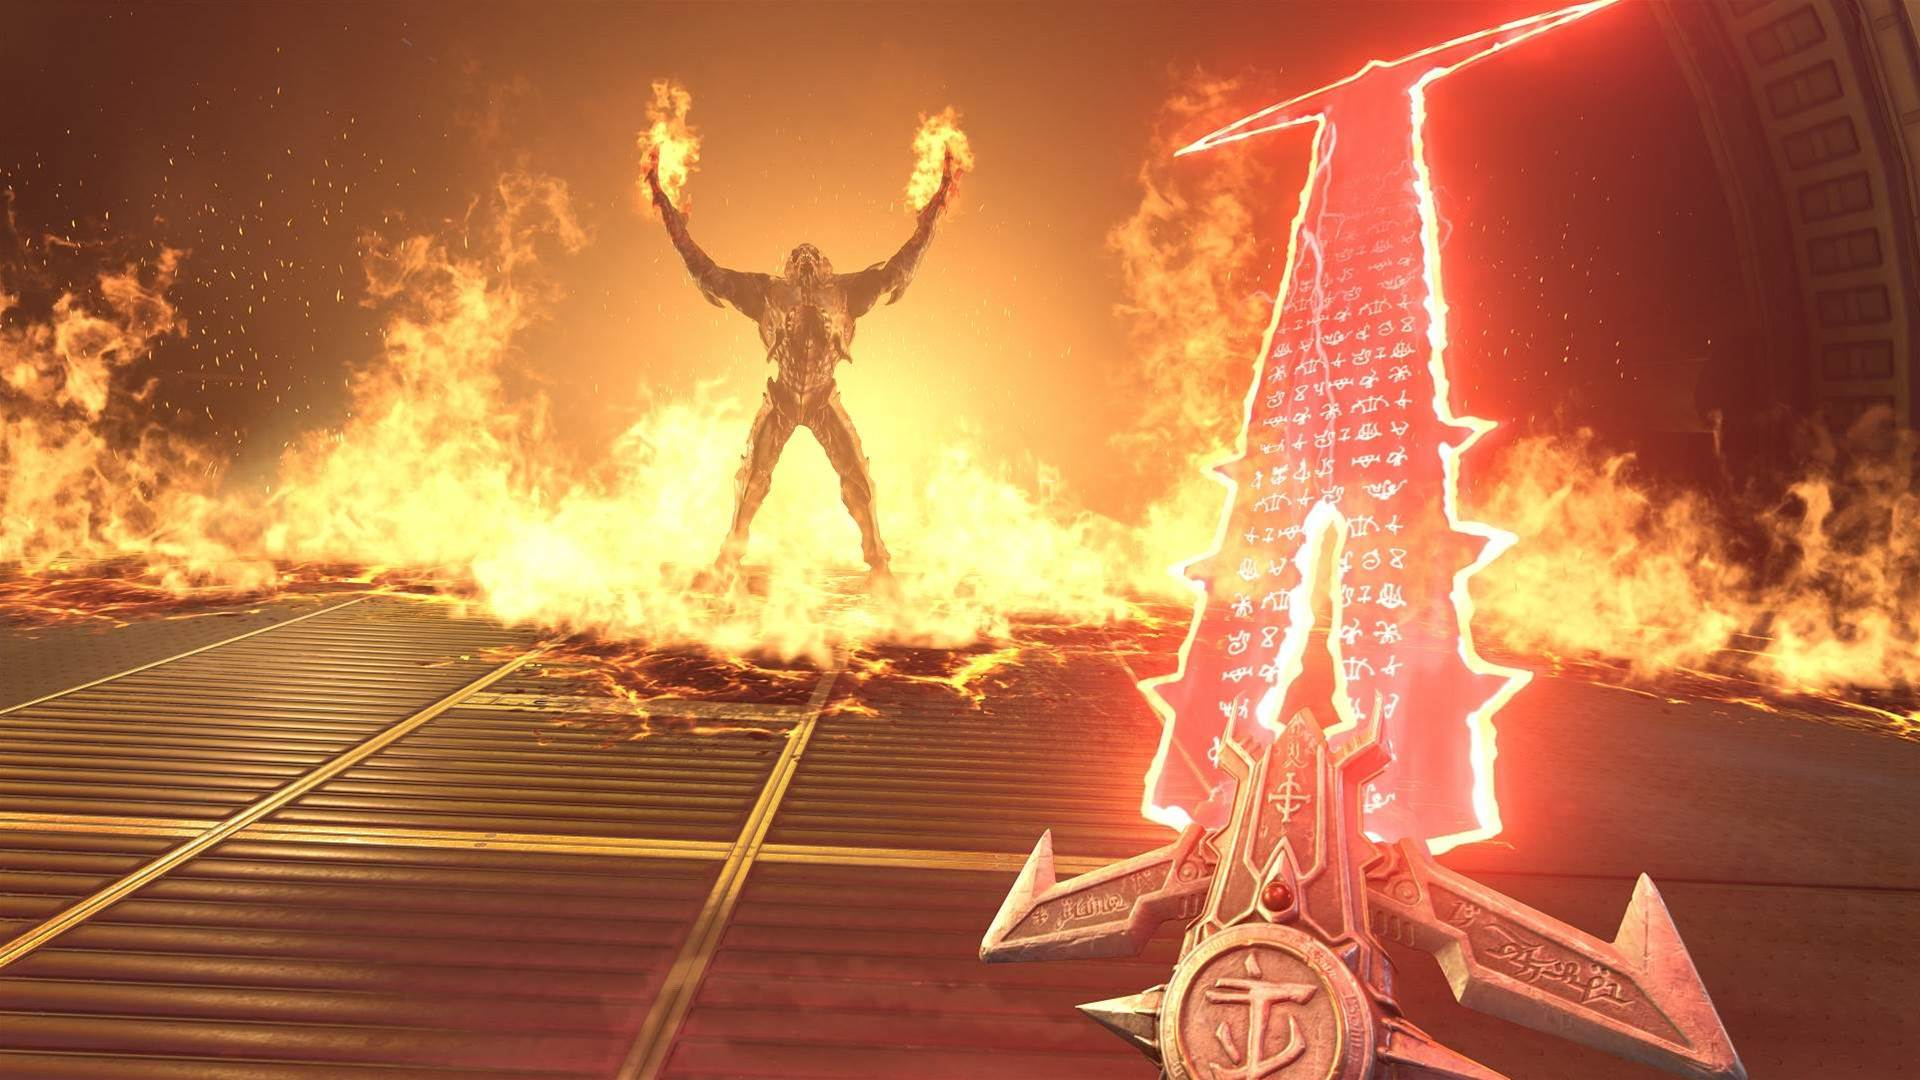 Hell yeah! Doom Eternal screens and concept art